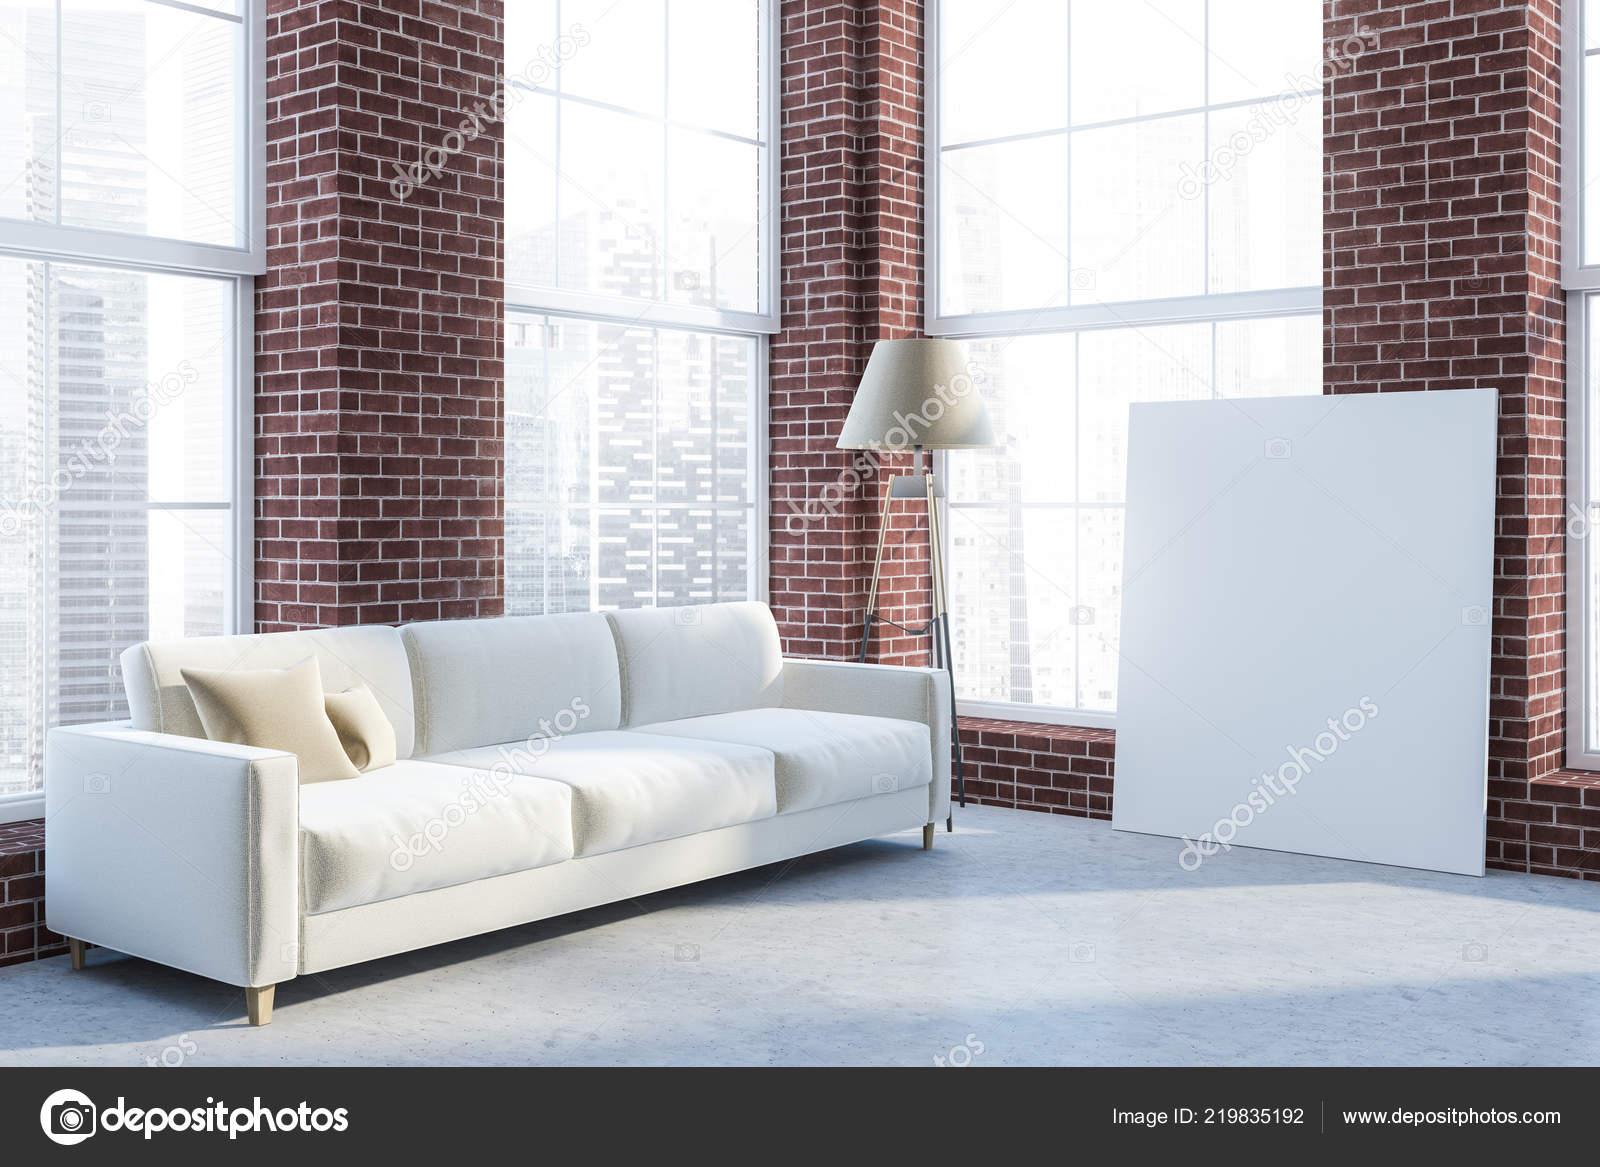 pisos de concreto sala de estar Interior Sala Estar Lujo Con Paredes Ladrillo Piso Concreto